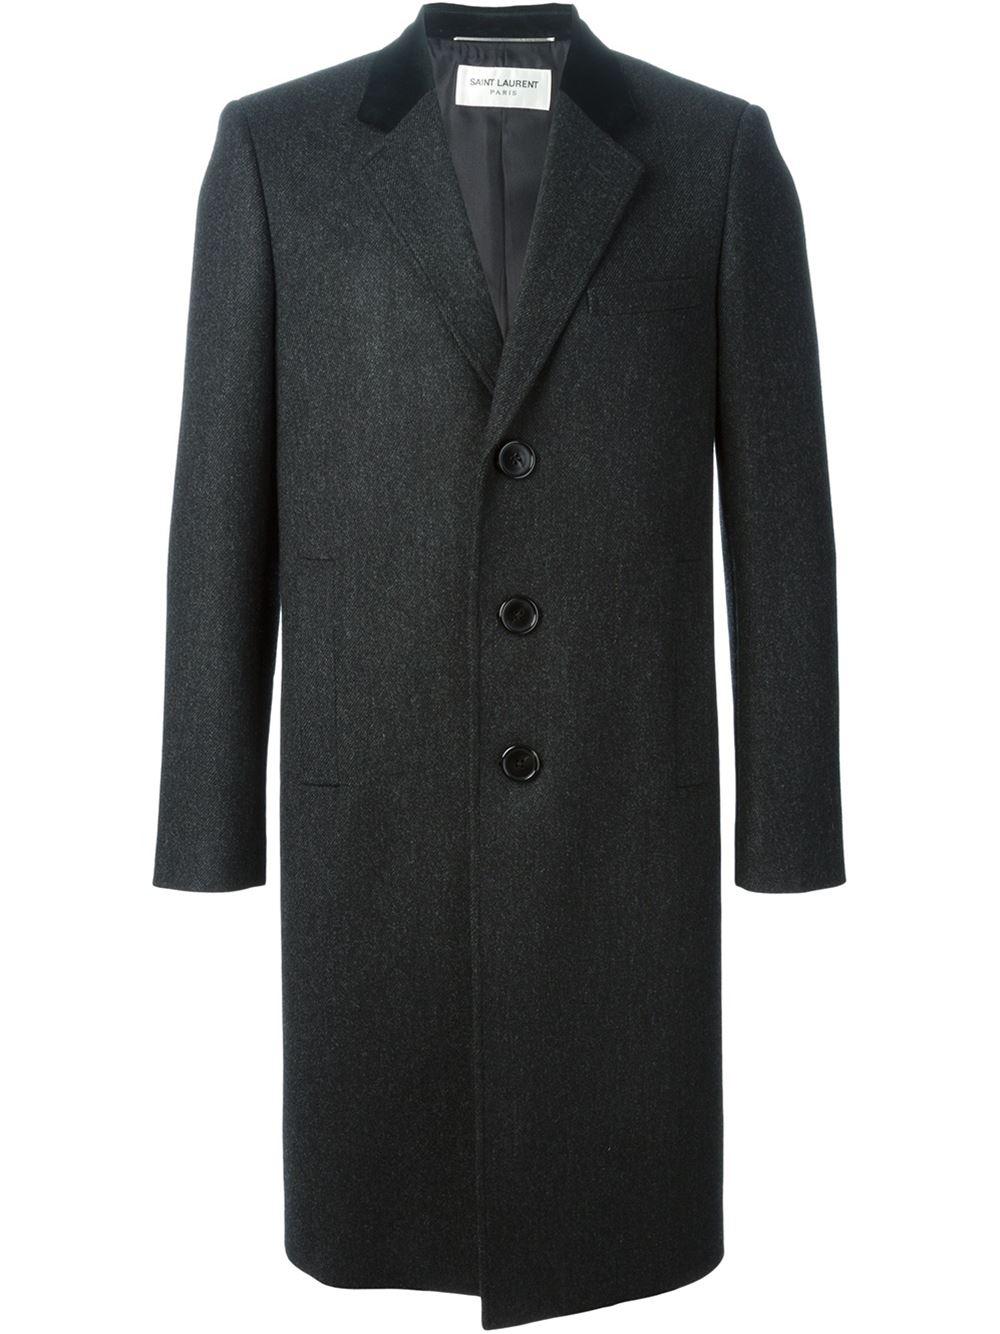 Saint Laurent Classic Chesterfield Coat In Gray For Men Lyst